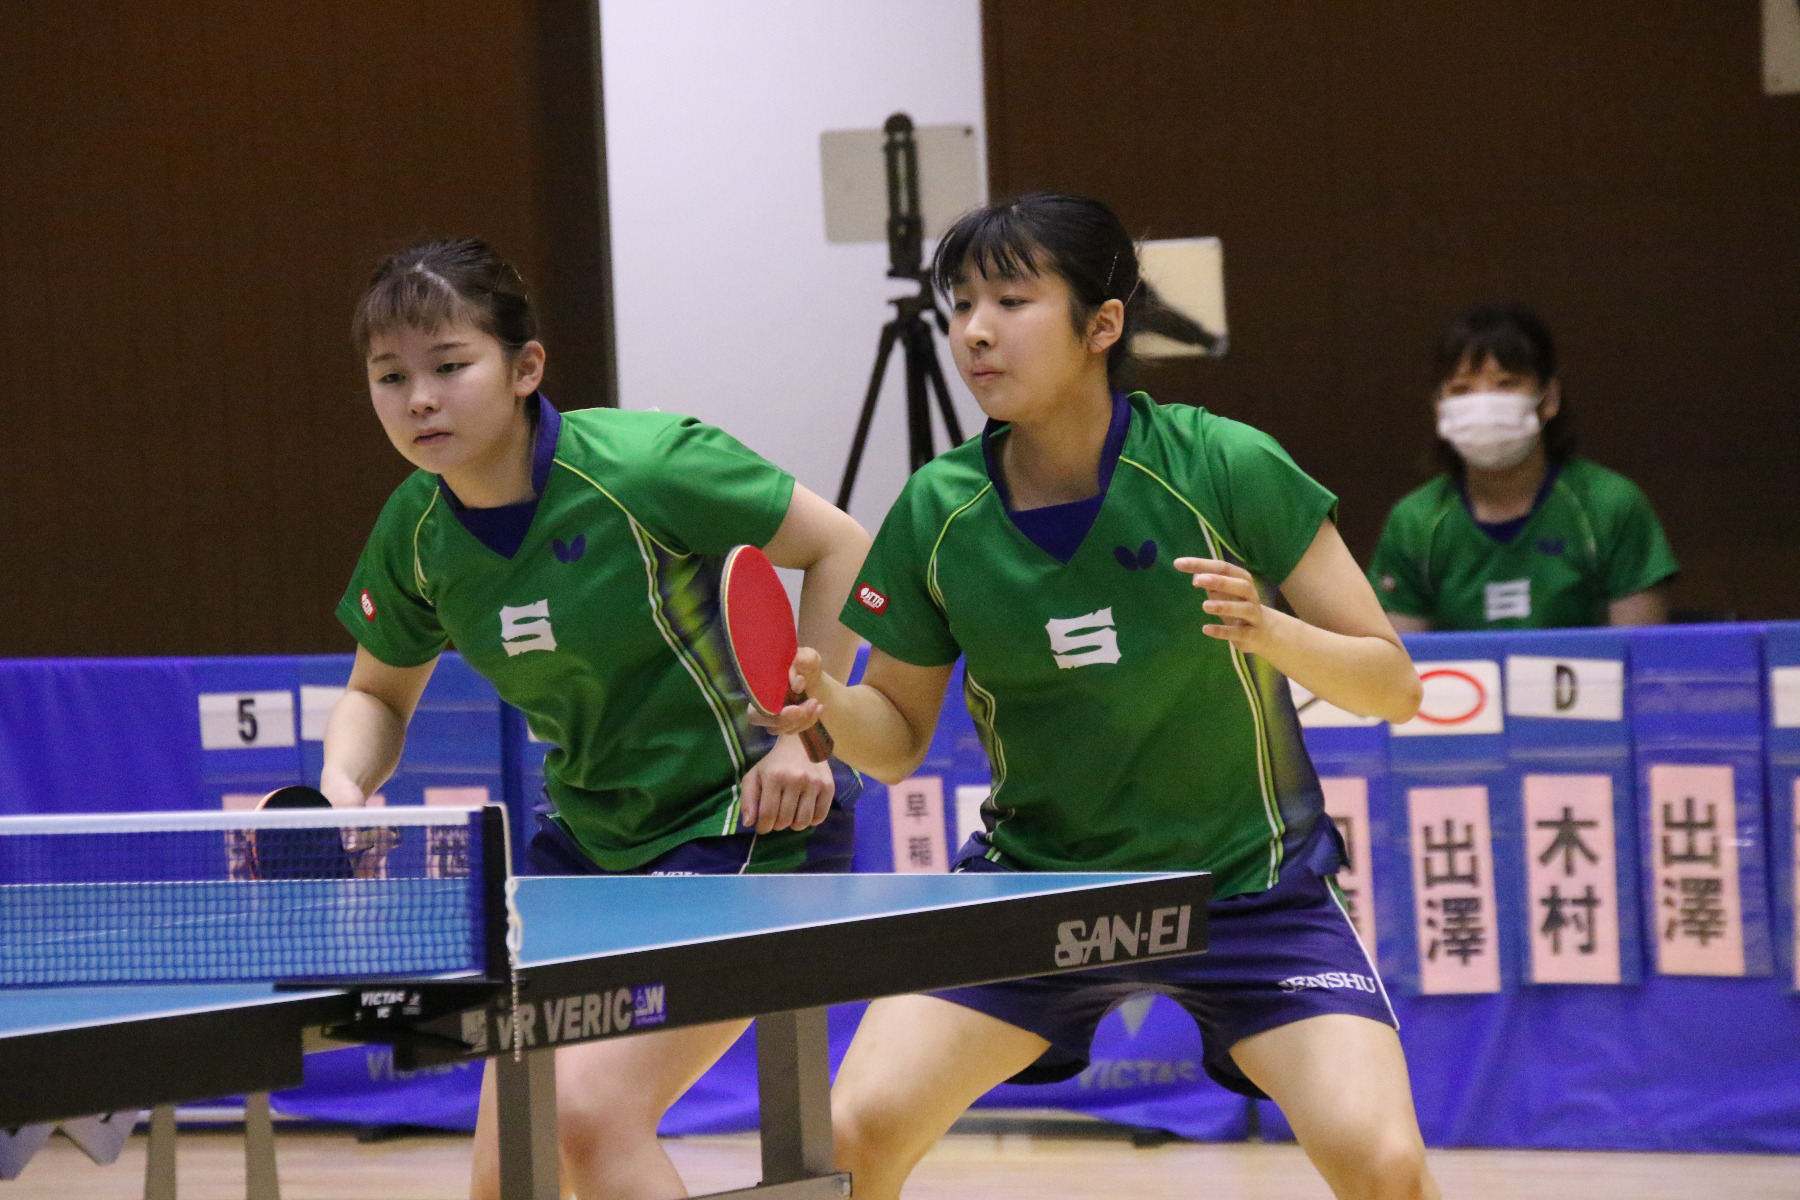 VICTAS ヴィクタス VICTAS PLAY ヴィクタスプレイ 卓球 インカレ 全日本大学総合卓球選手権大会